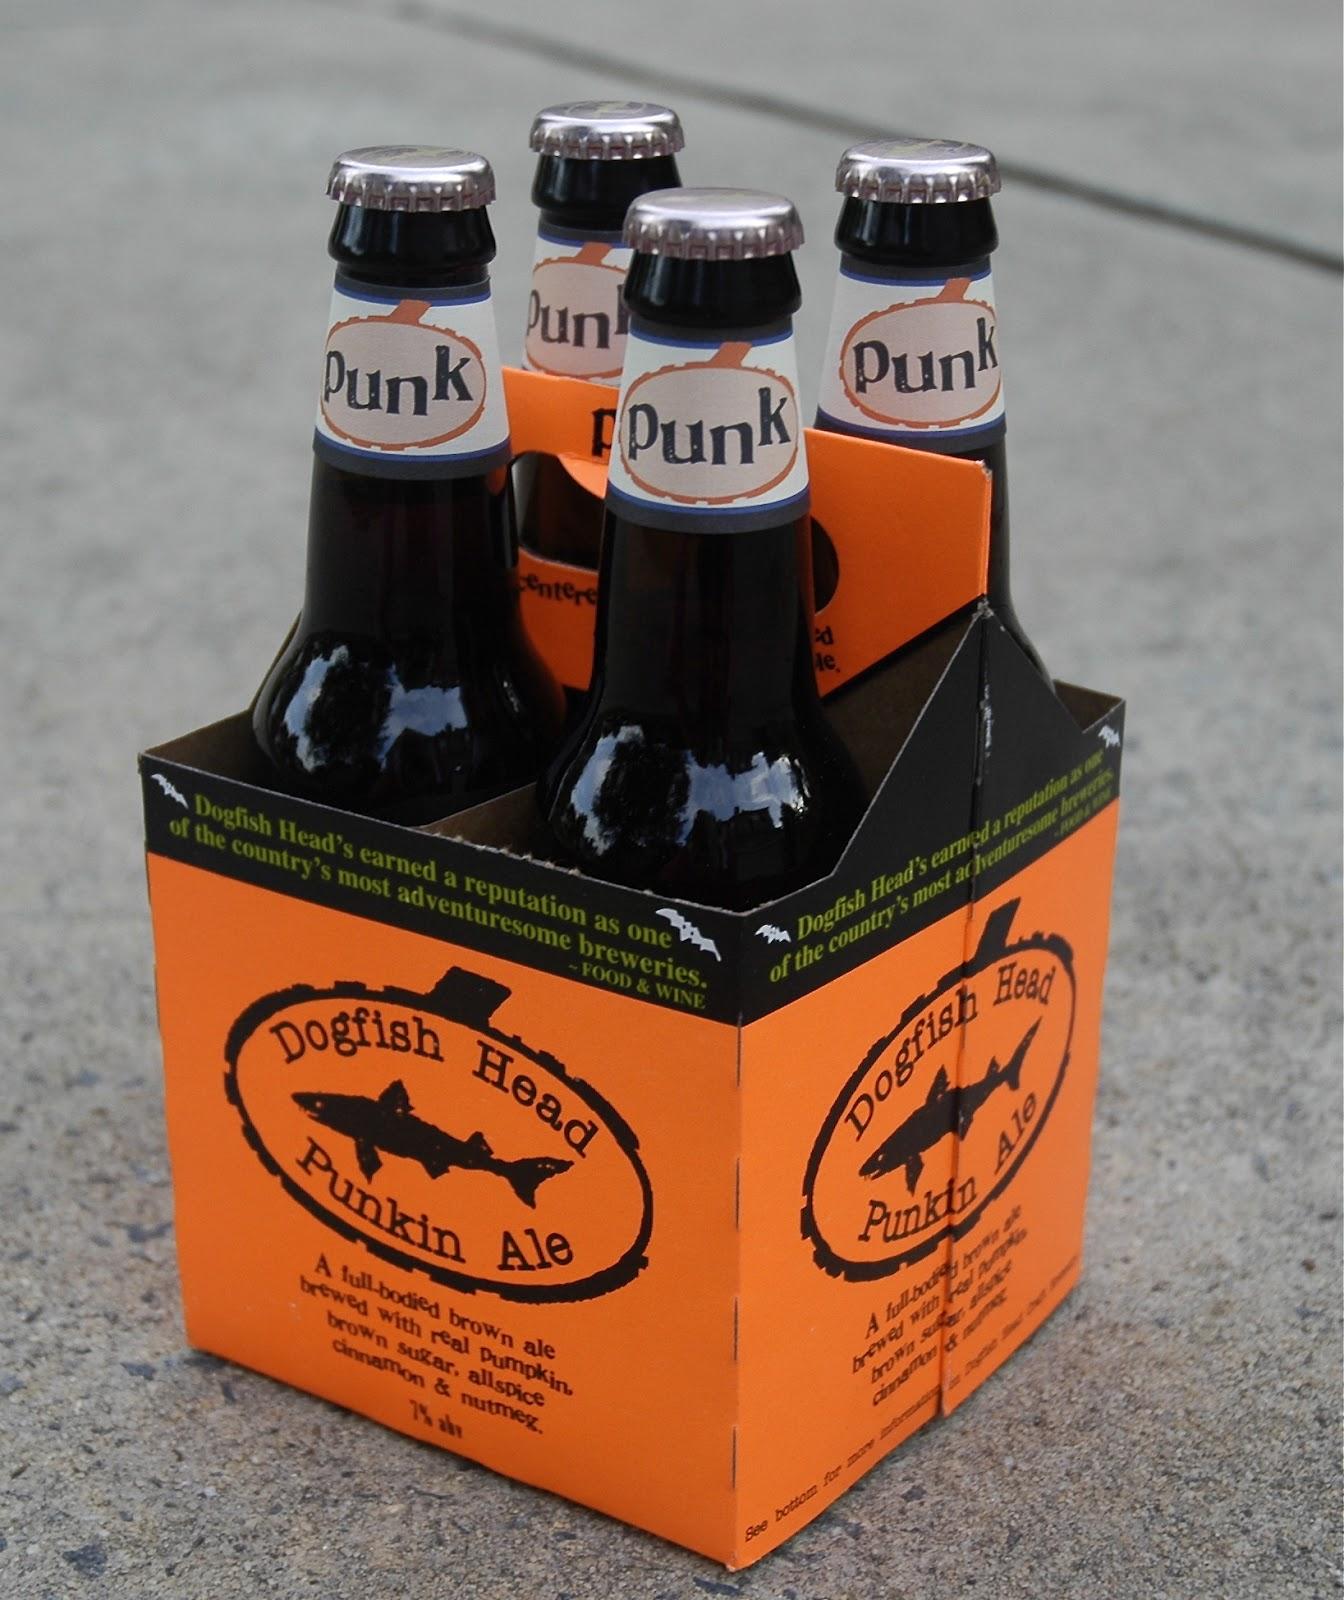 dogfish+head+punkin+ale+4.JPG